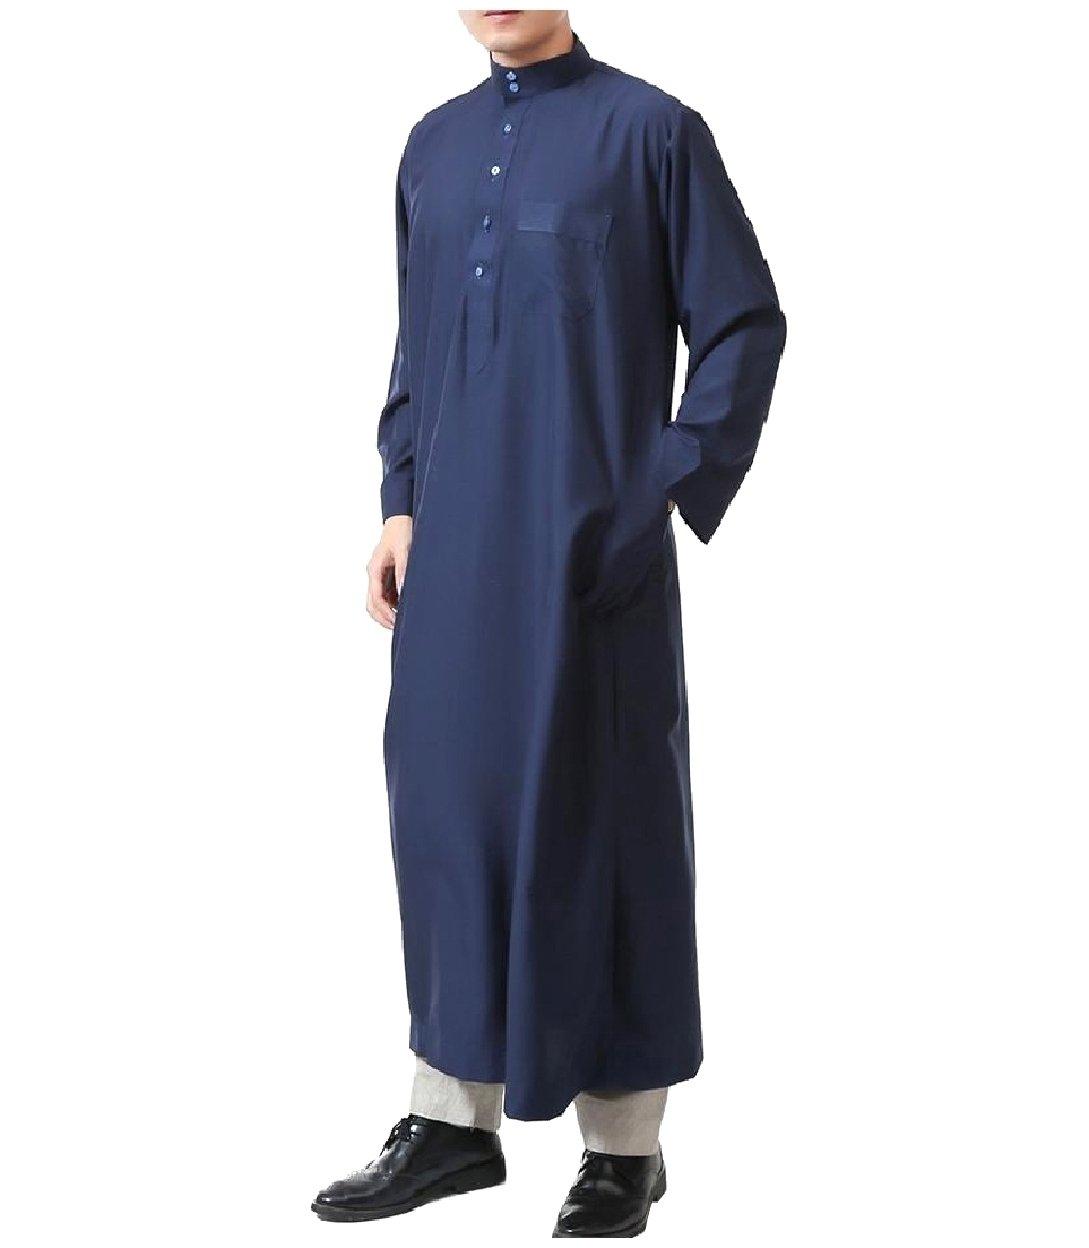 Tootless Mens Islamic With Pockets Saudi Arabia Muslim Thobes Dishdasha Navy Blue 52